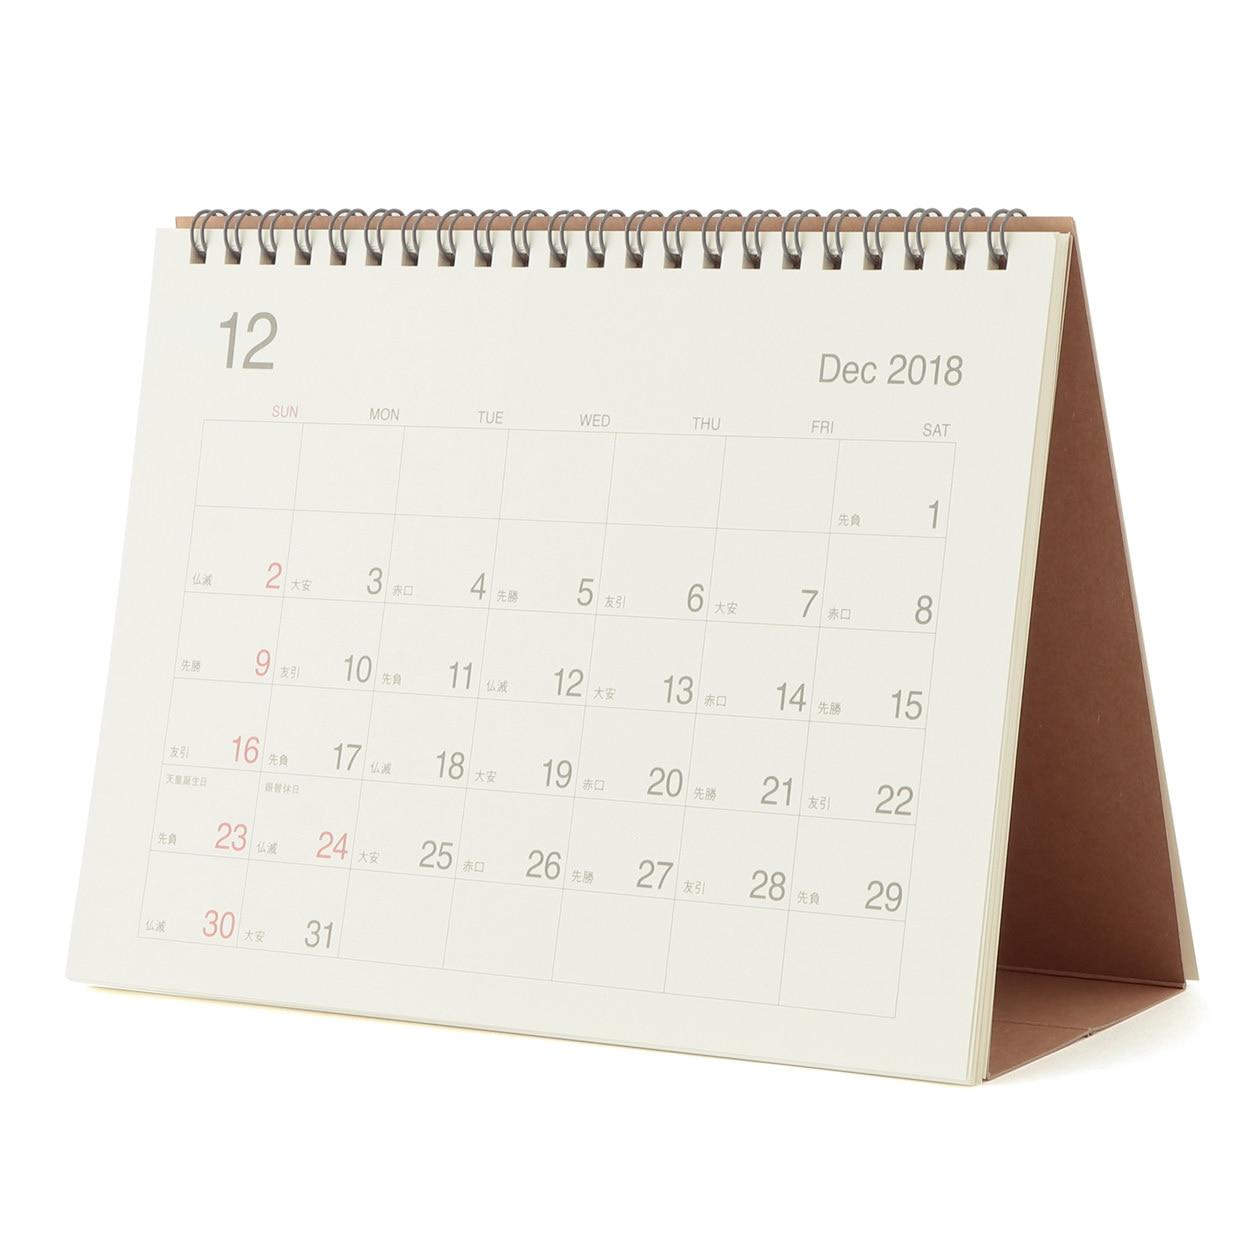 RoomClip商品情報 - バガスペーパー日曜始まり六輝カレンダー・中